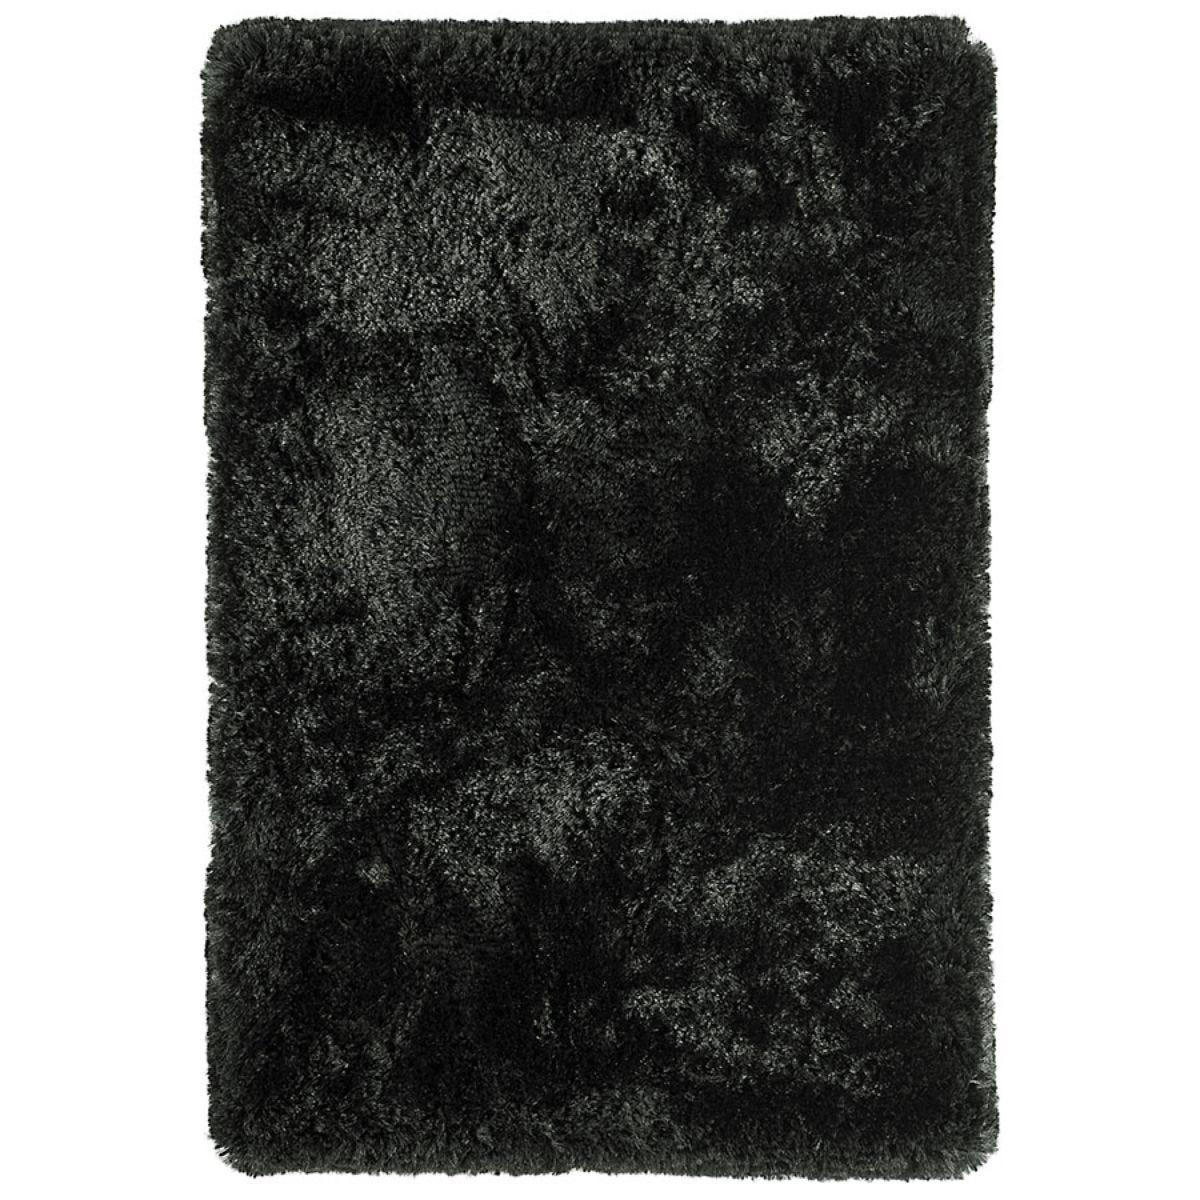 Asiatic Plush Shaggy Rug, 70 x 140cm - Black